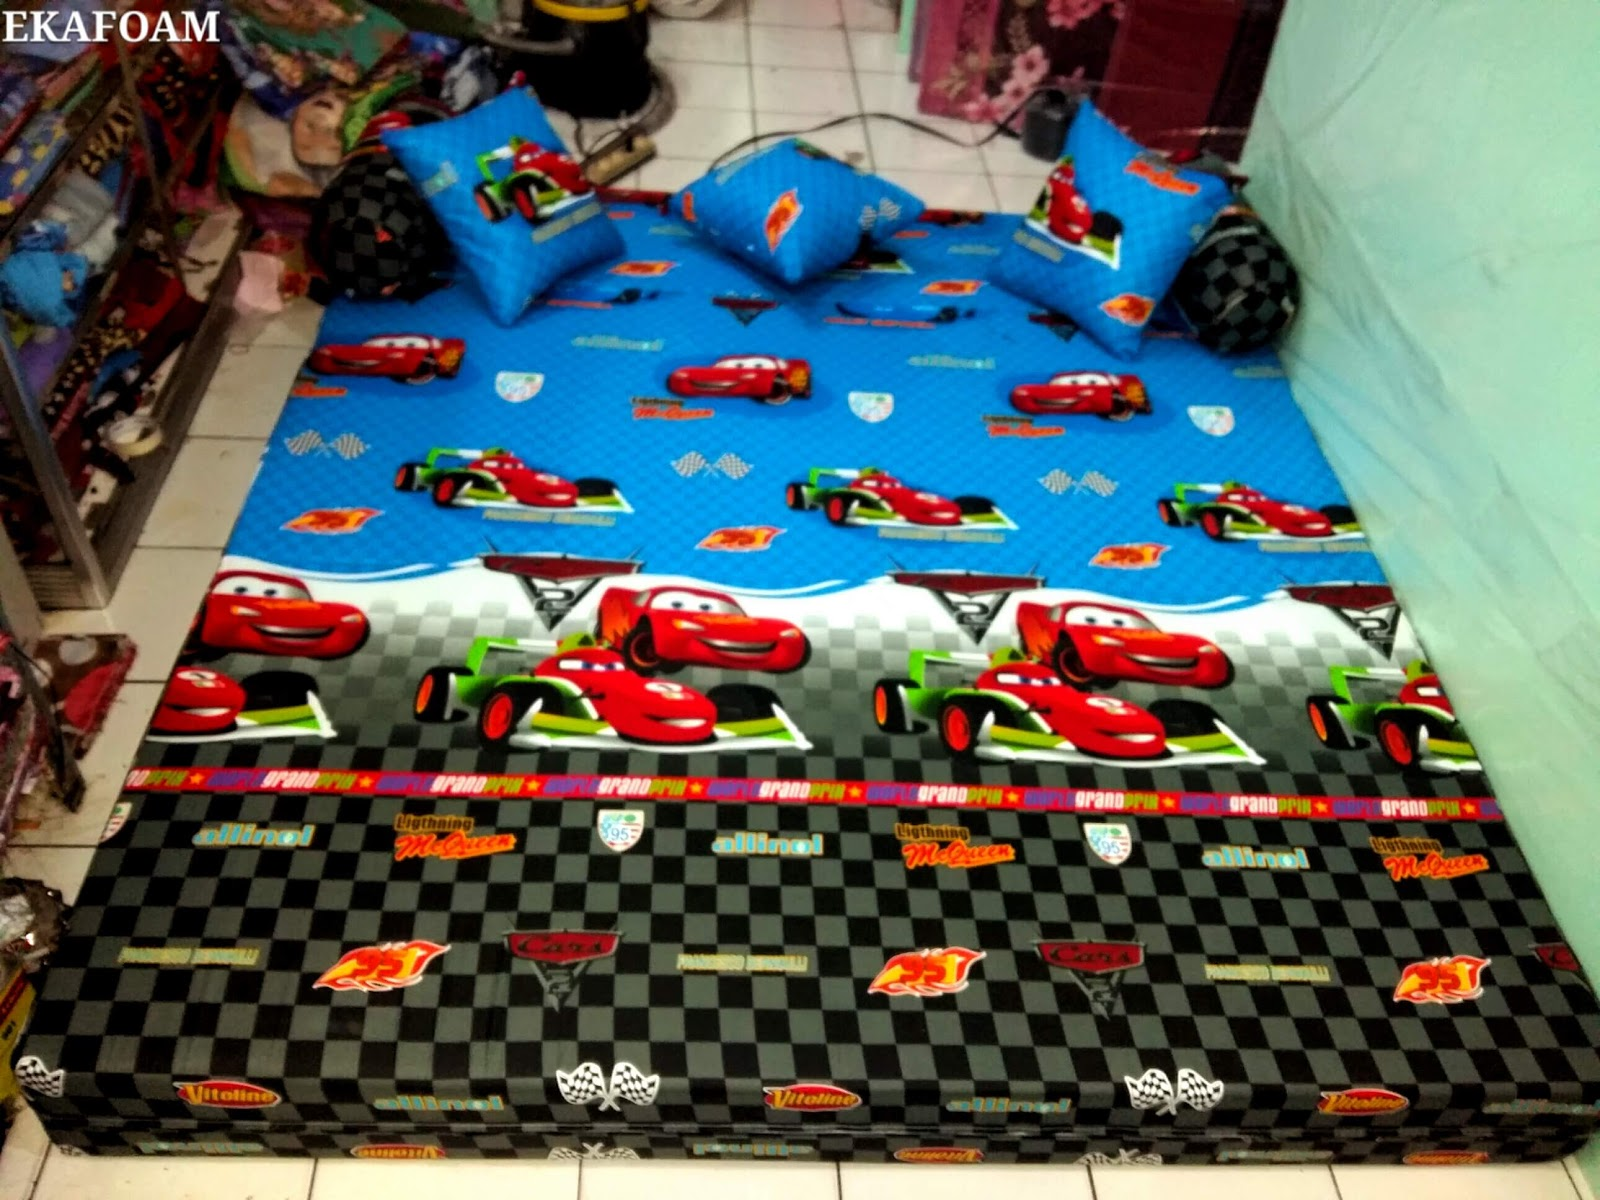 sofa bed kasur busa lipat inoac jakarta modular 2016 motif the car biru agen